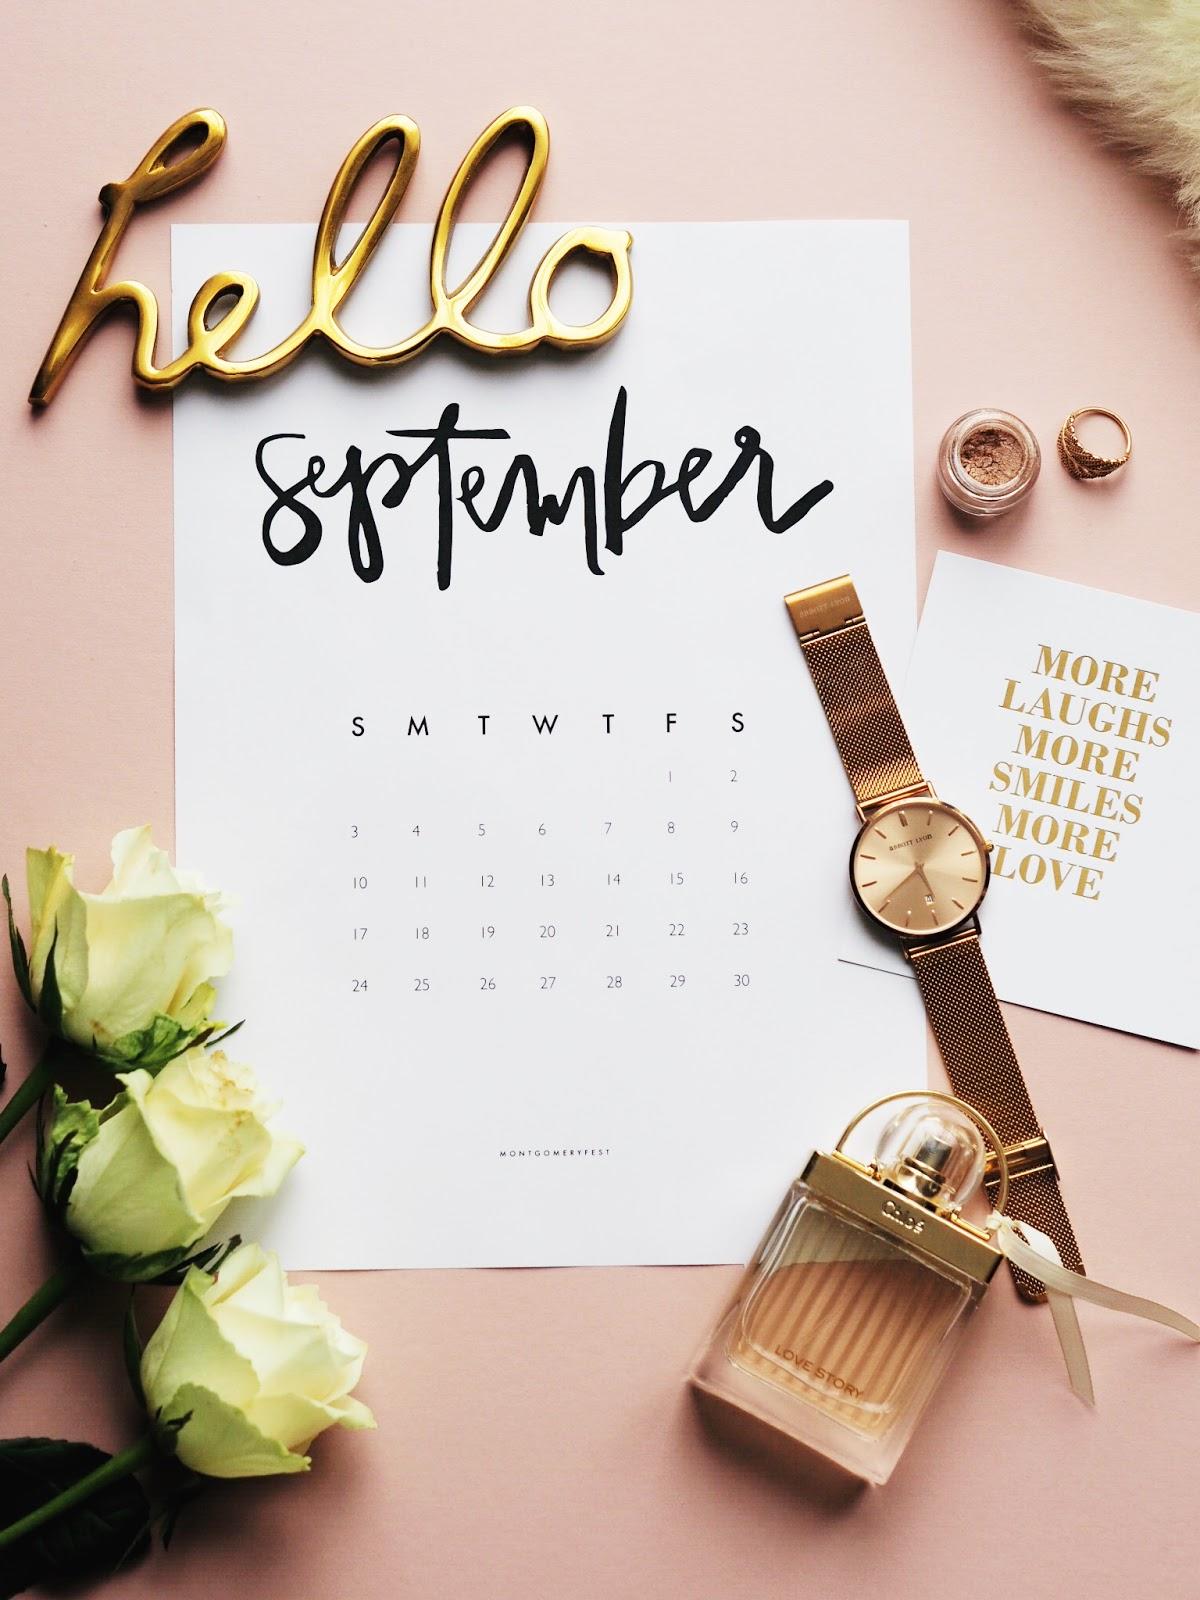 Lifestyle   September Goals Hello September Flat Lay Roses Perfume Watch Make up Calendar